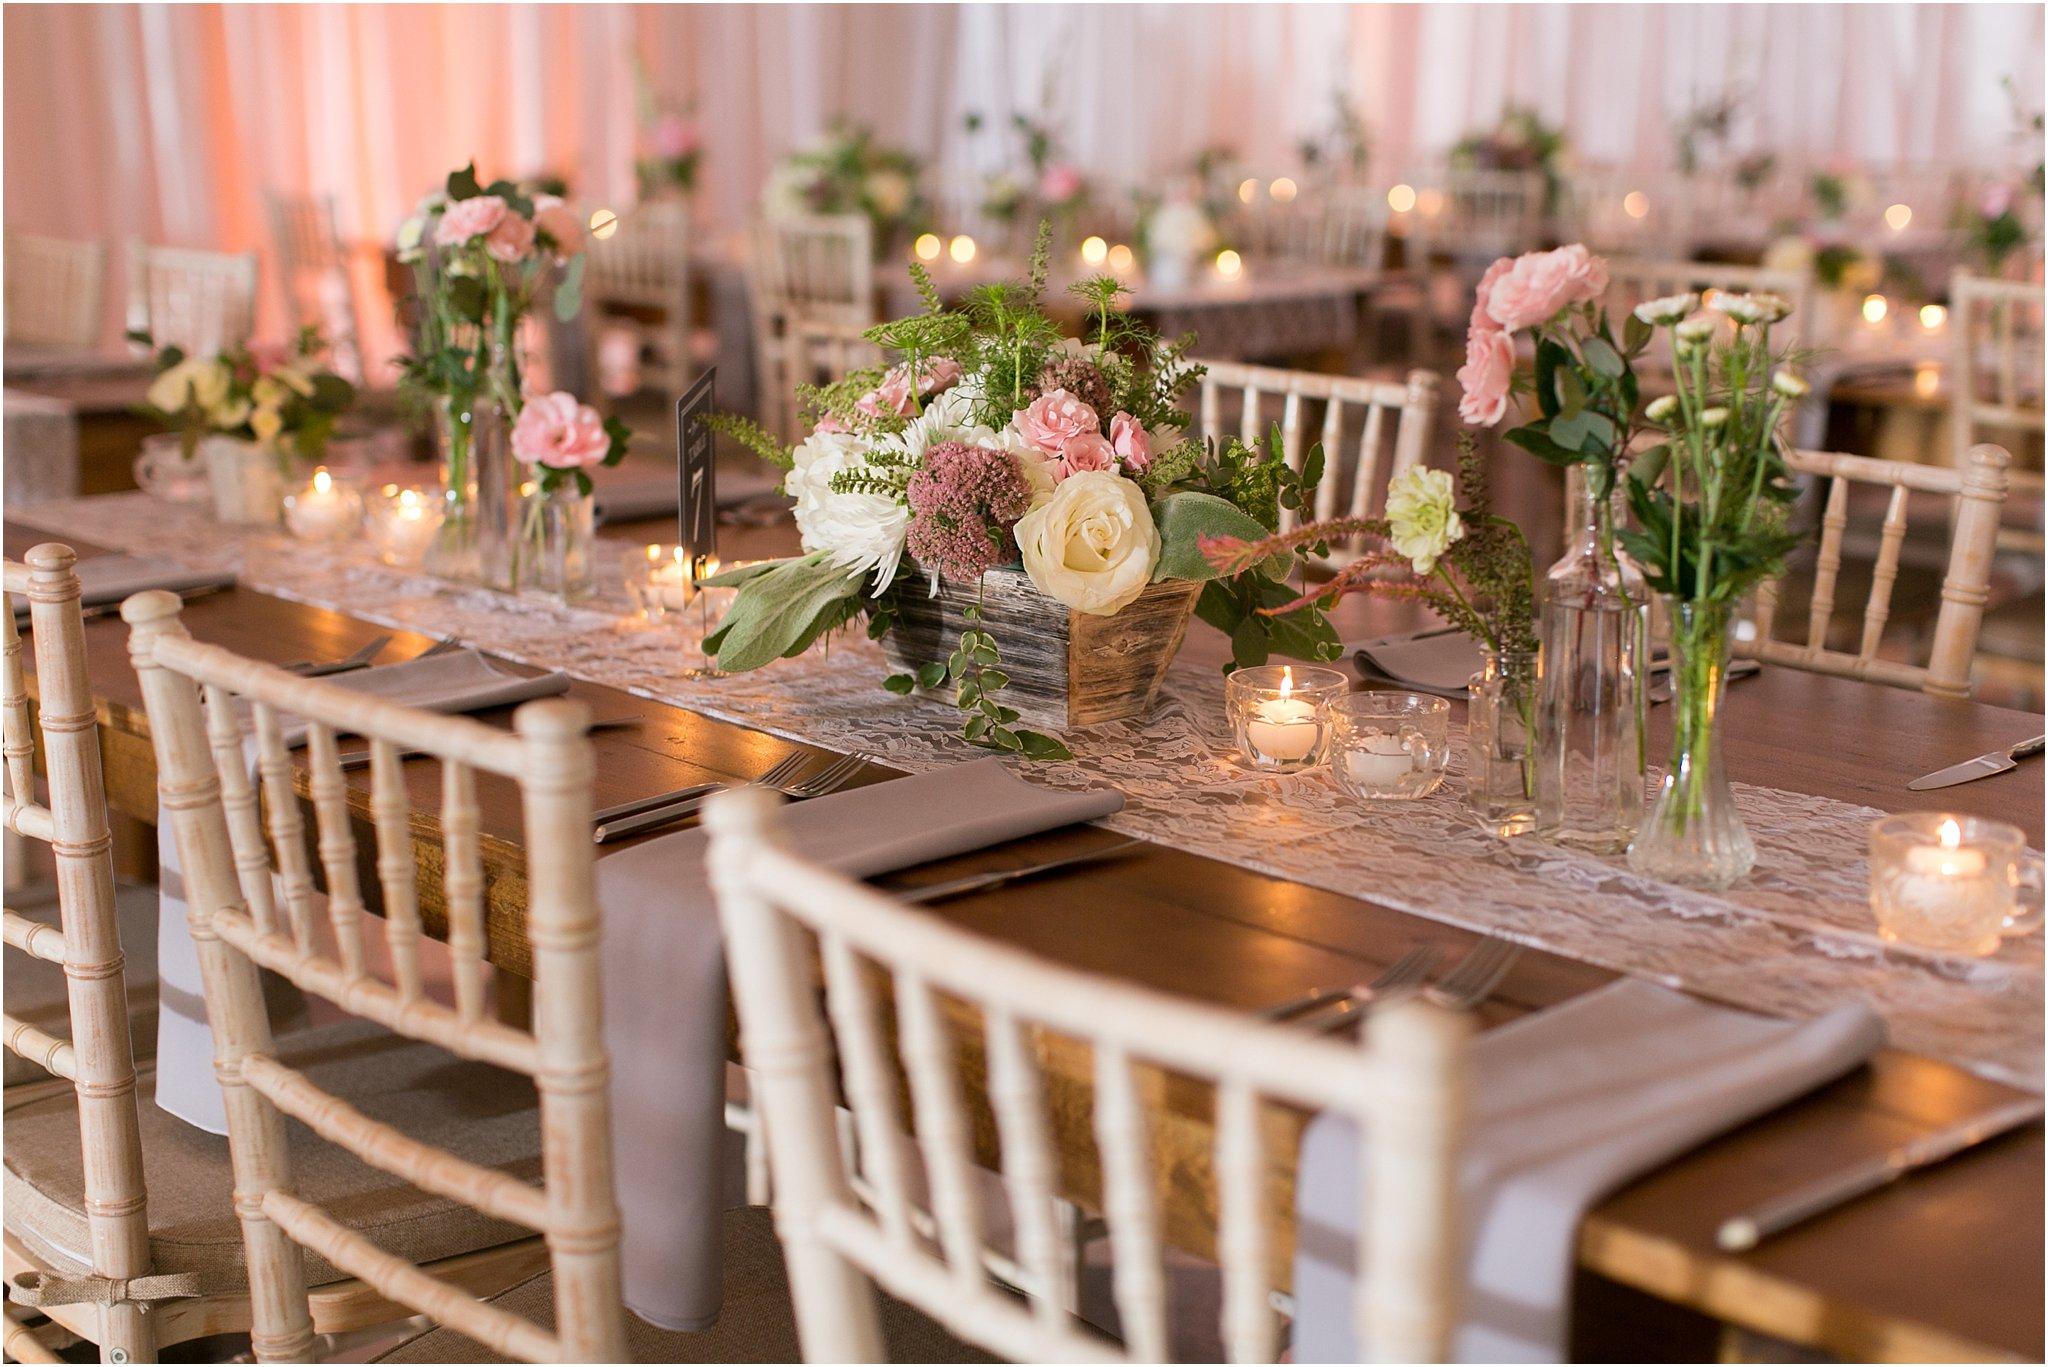 jessica_ryan_photography_virginia_wedding_photographer_wedding_hurricane_norfolk_botanical_gardens_hurricane_matthew_wedding_3617